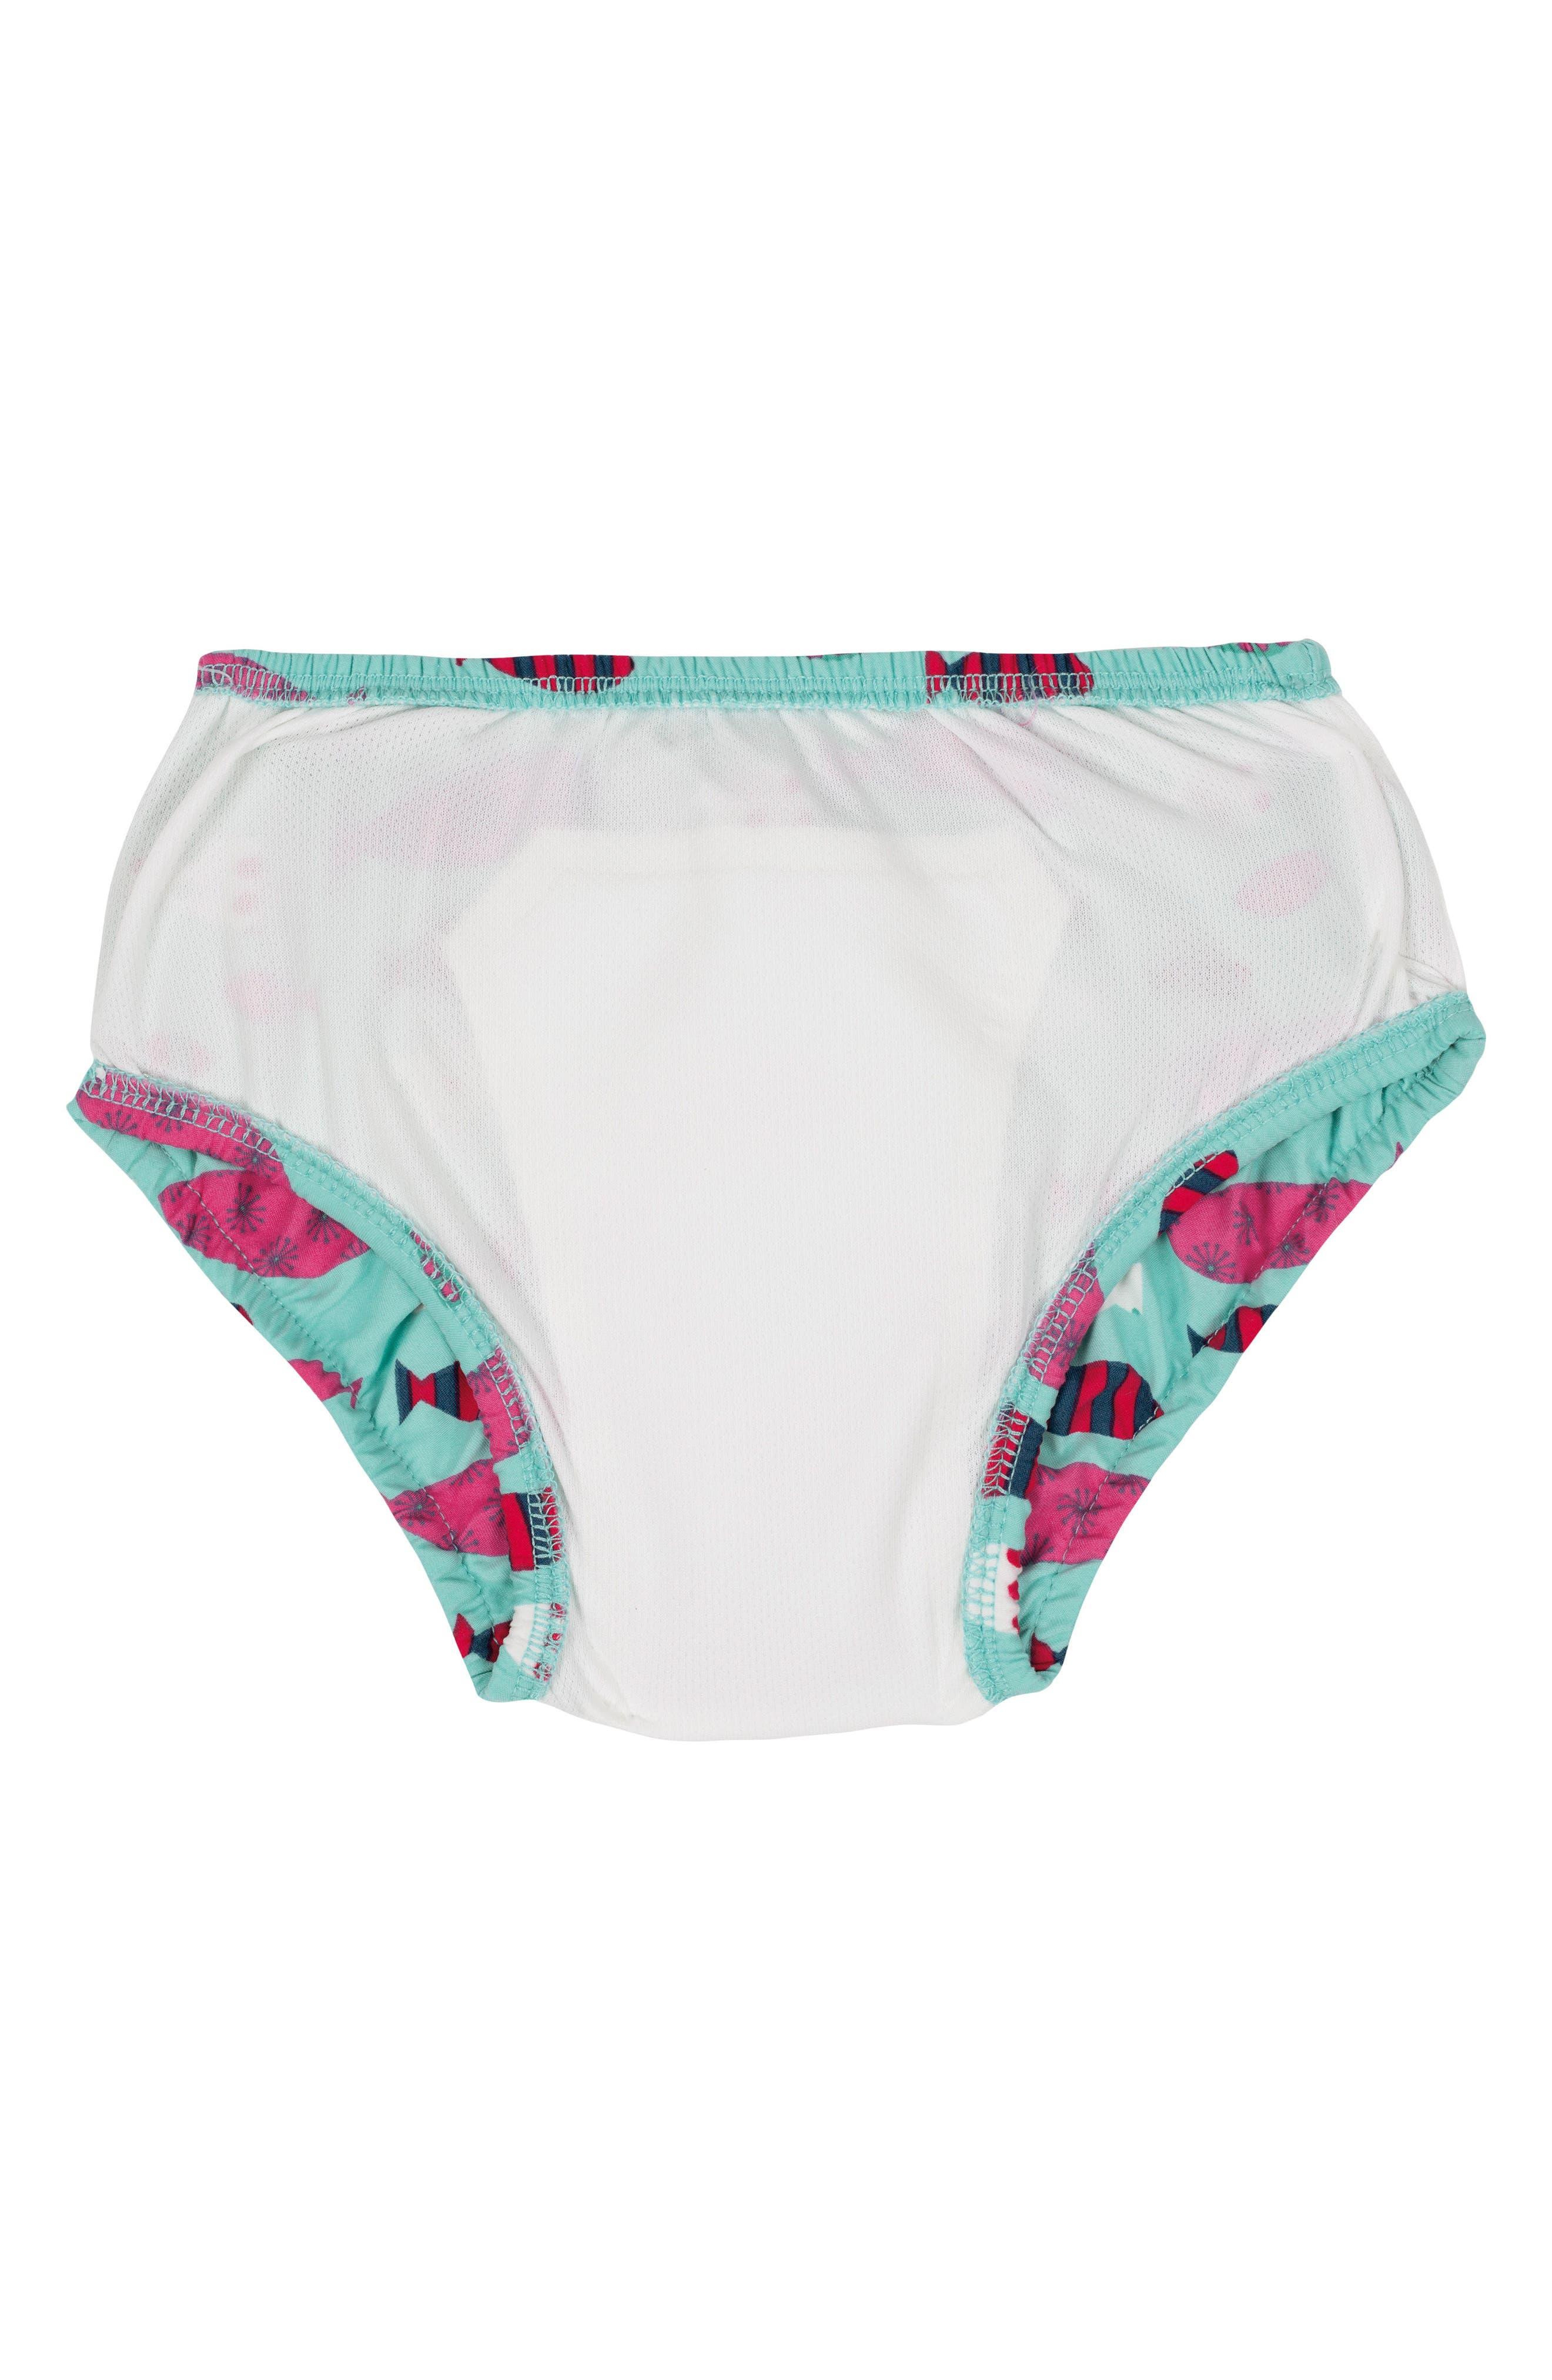 Mr. Fish Swim Diaper Cover,                             Alternate thumbnail 3, color,                             400